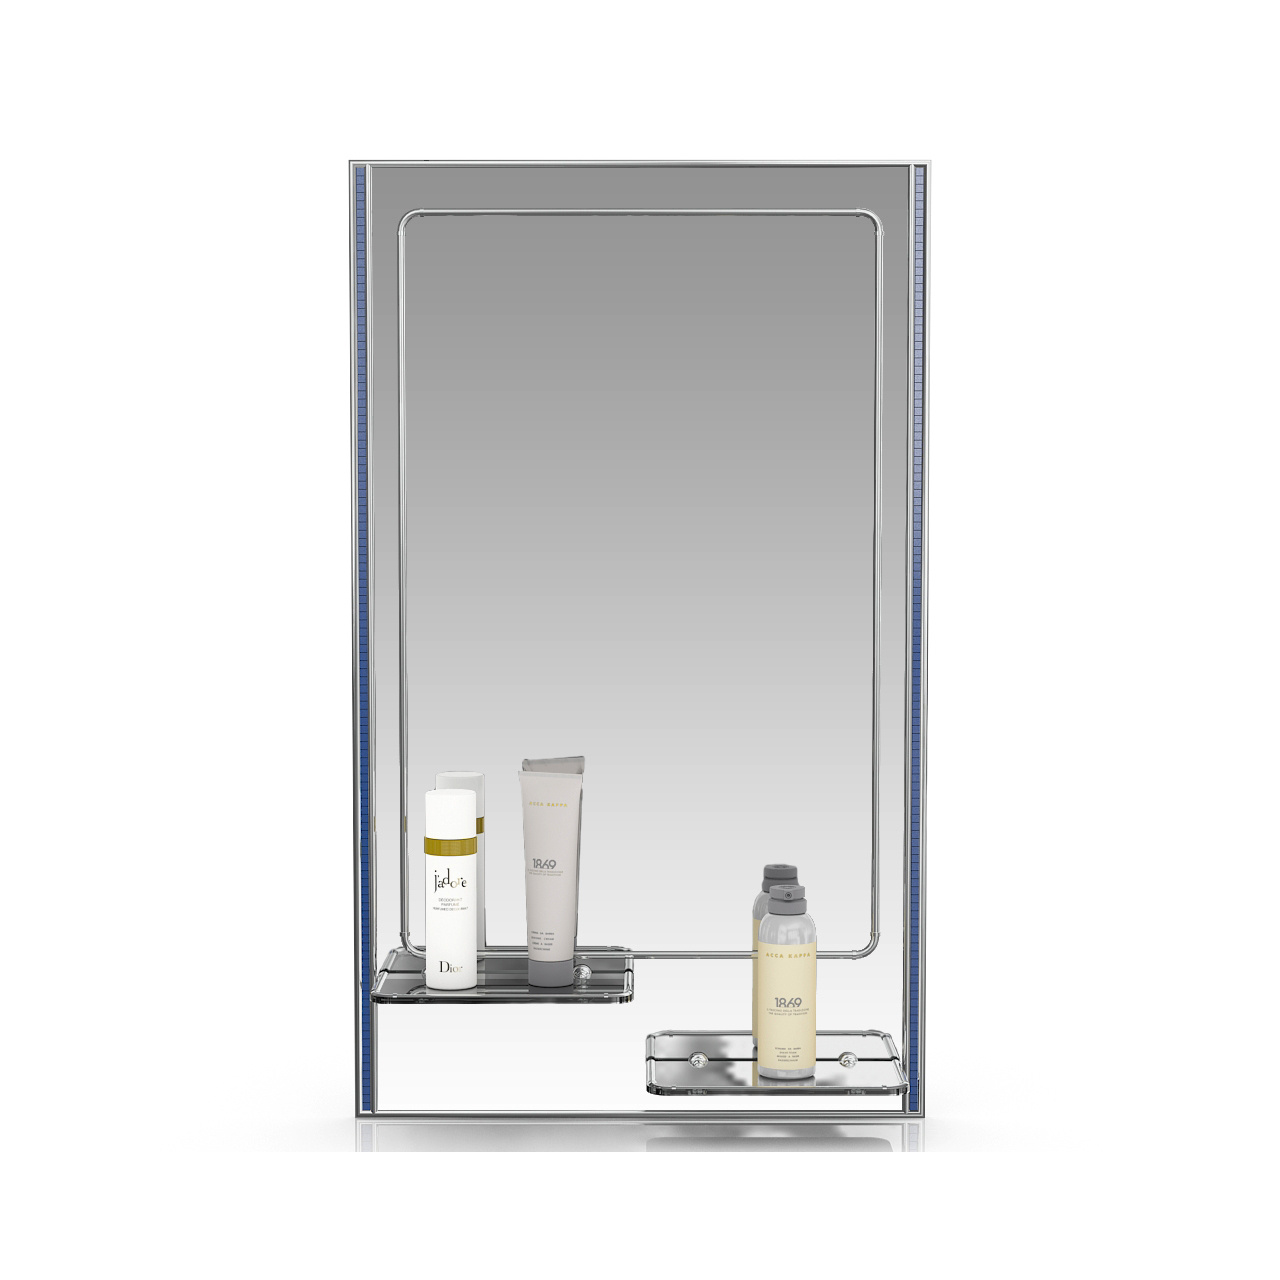 Зеркало ЕвроЗеркало 123ПЛ серебро куб голубой, 45х75